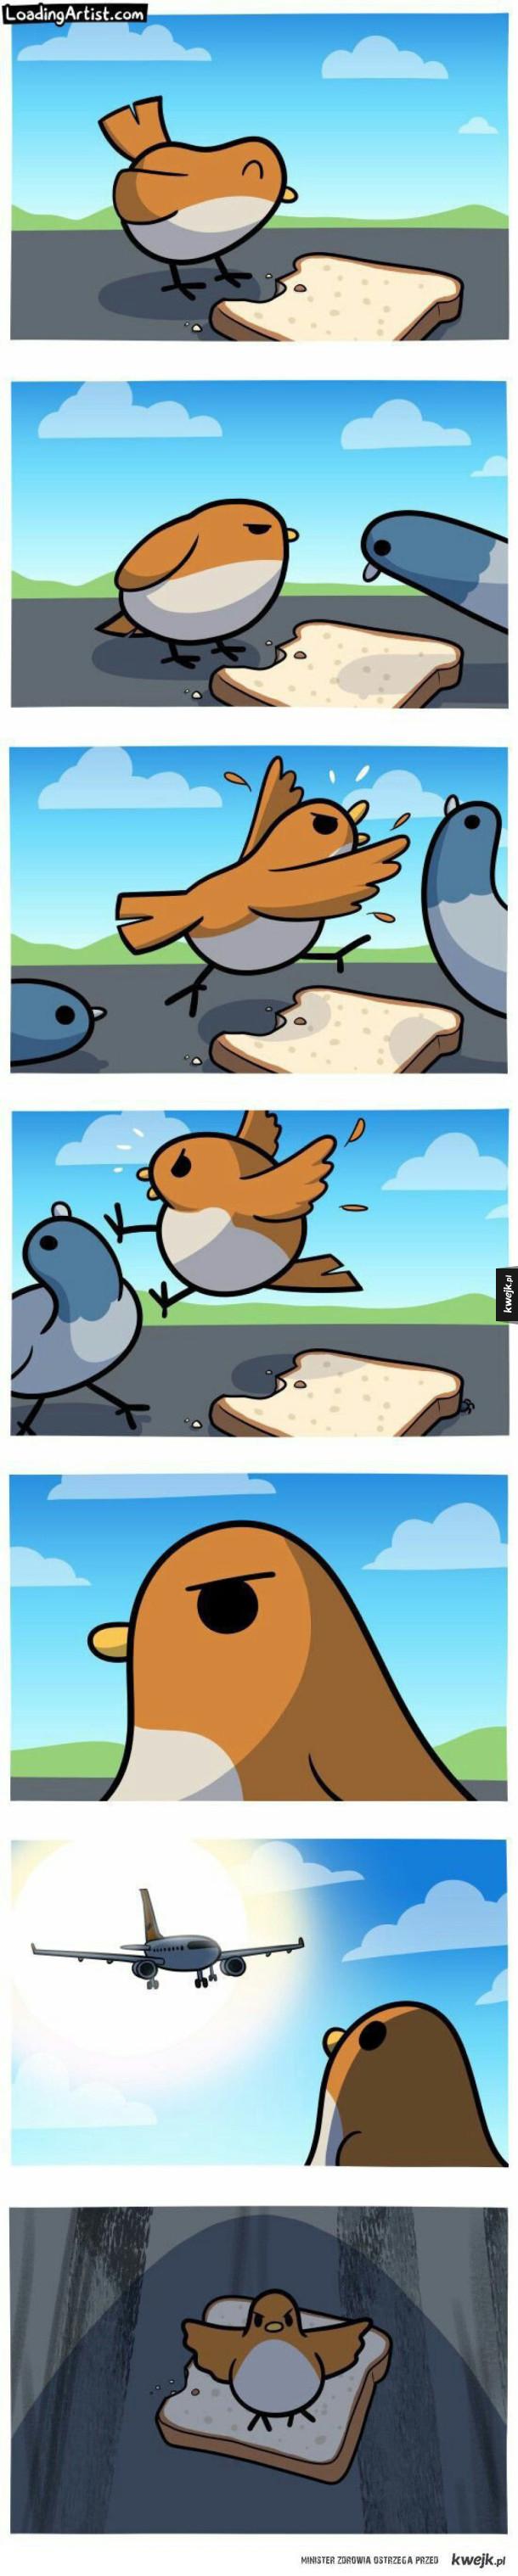 Chlebek